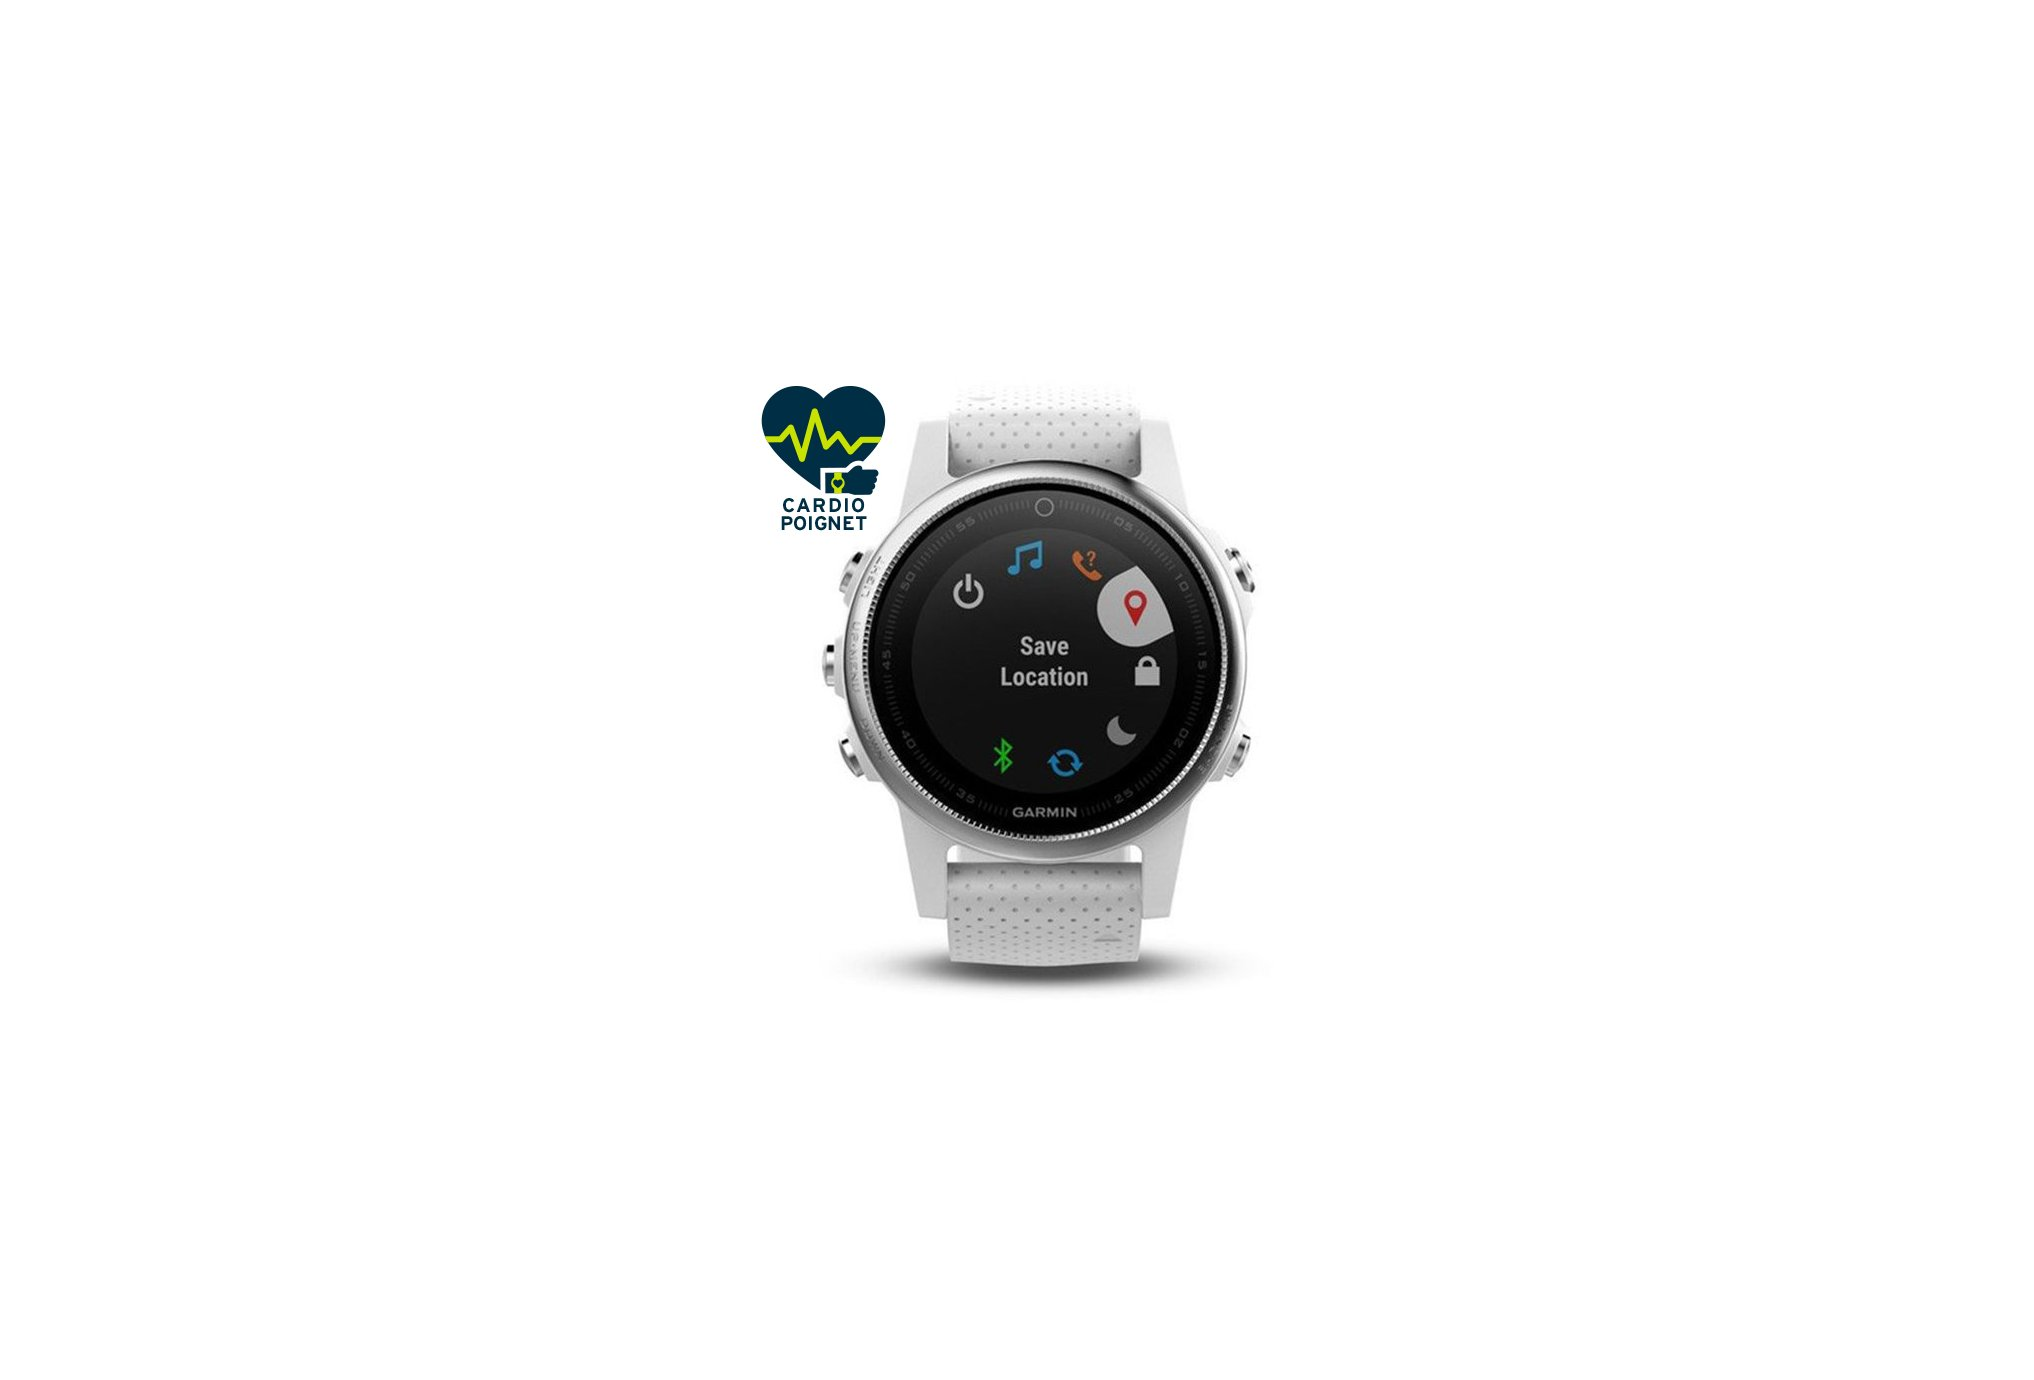 Garmin Reloj Fénix 5S GPS Multisports Cardio-Gps